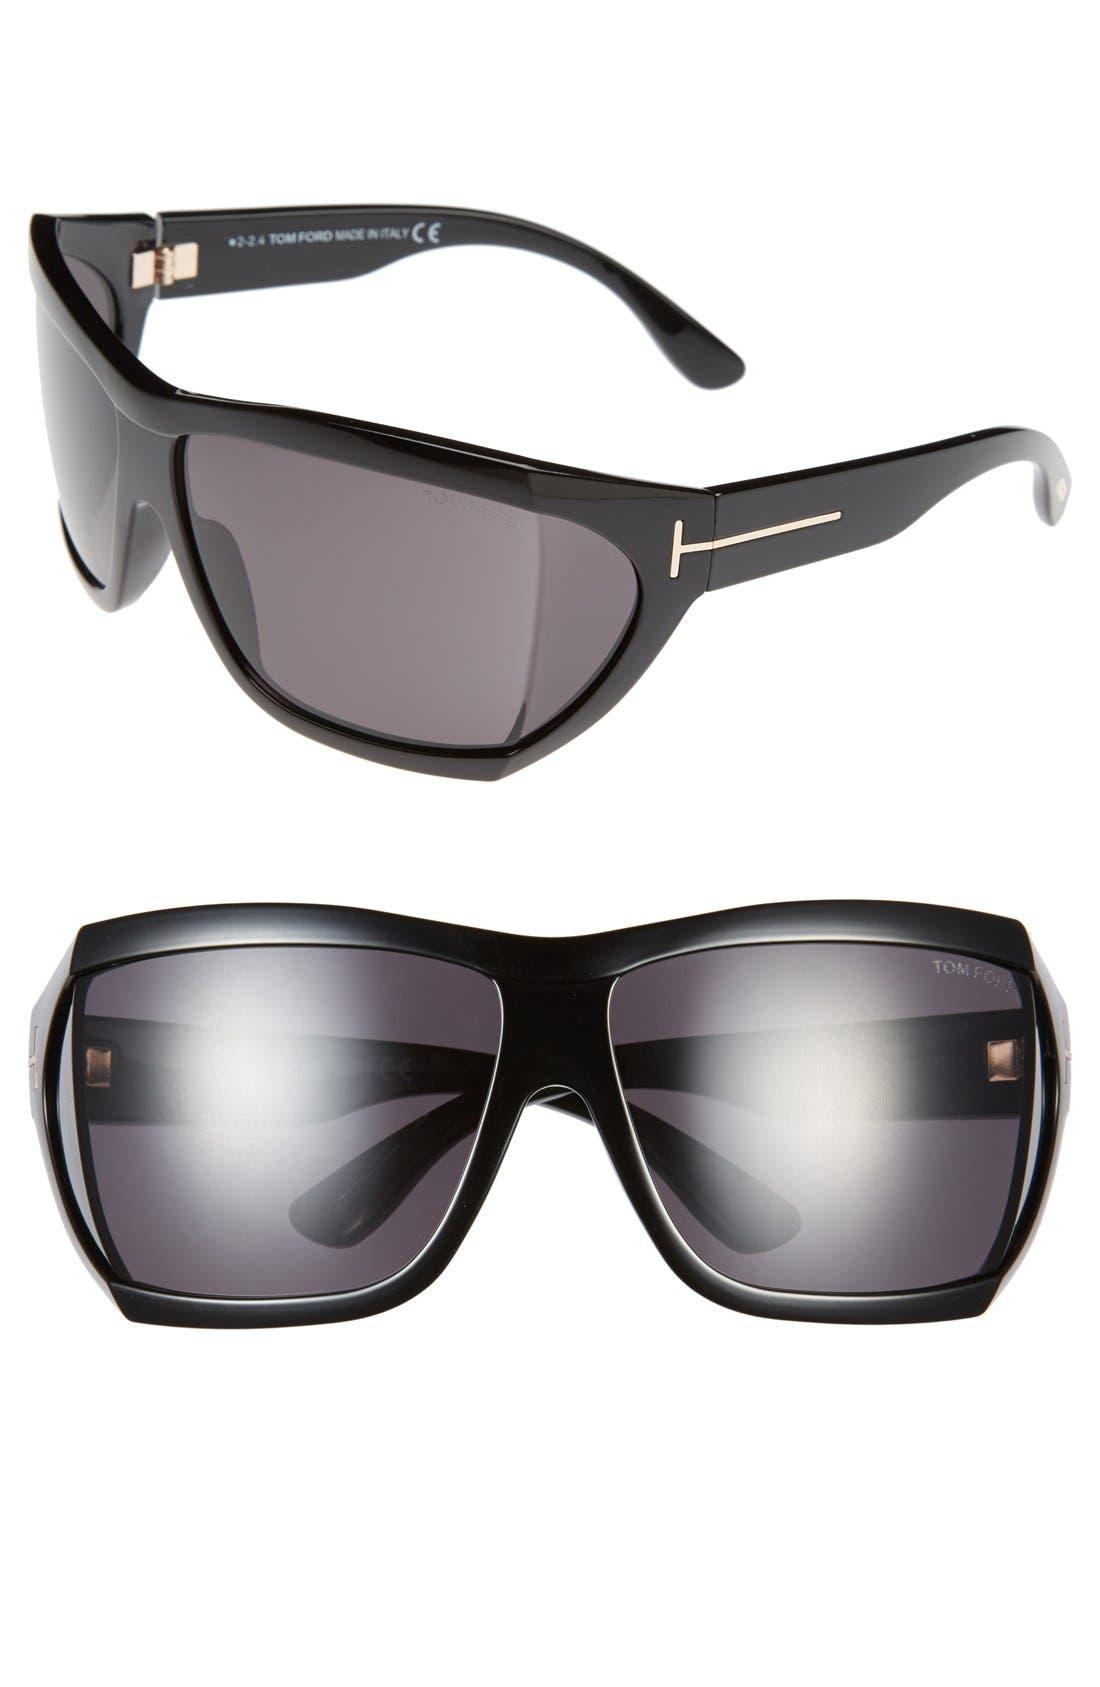 TOM FORD,                             'Sedgewick' 62mm Sunglasses,                             Main thumbnail 1, color,                             001